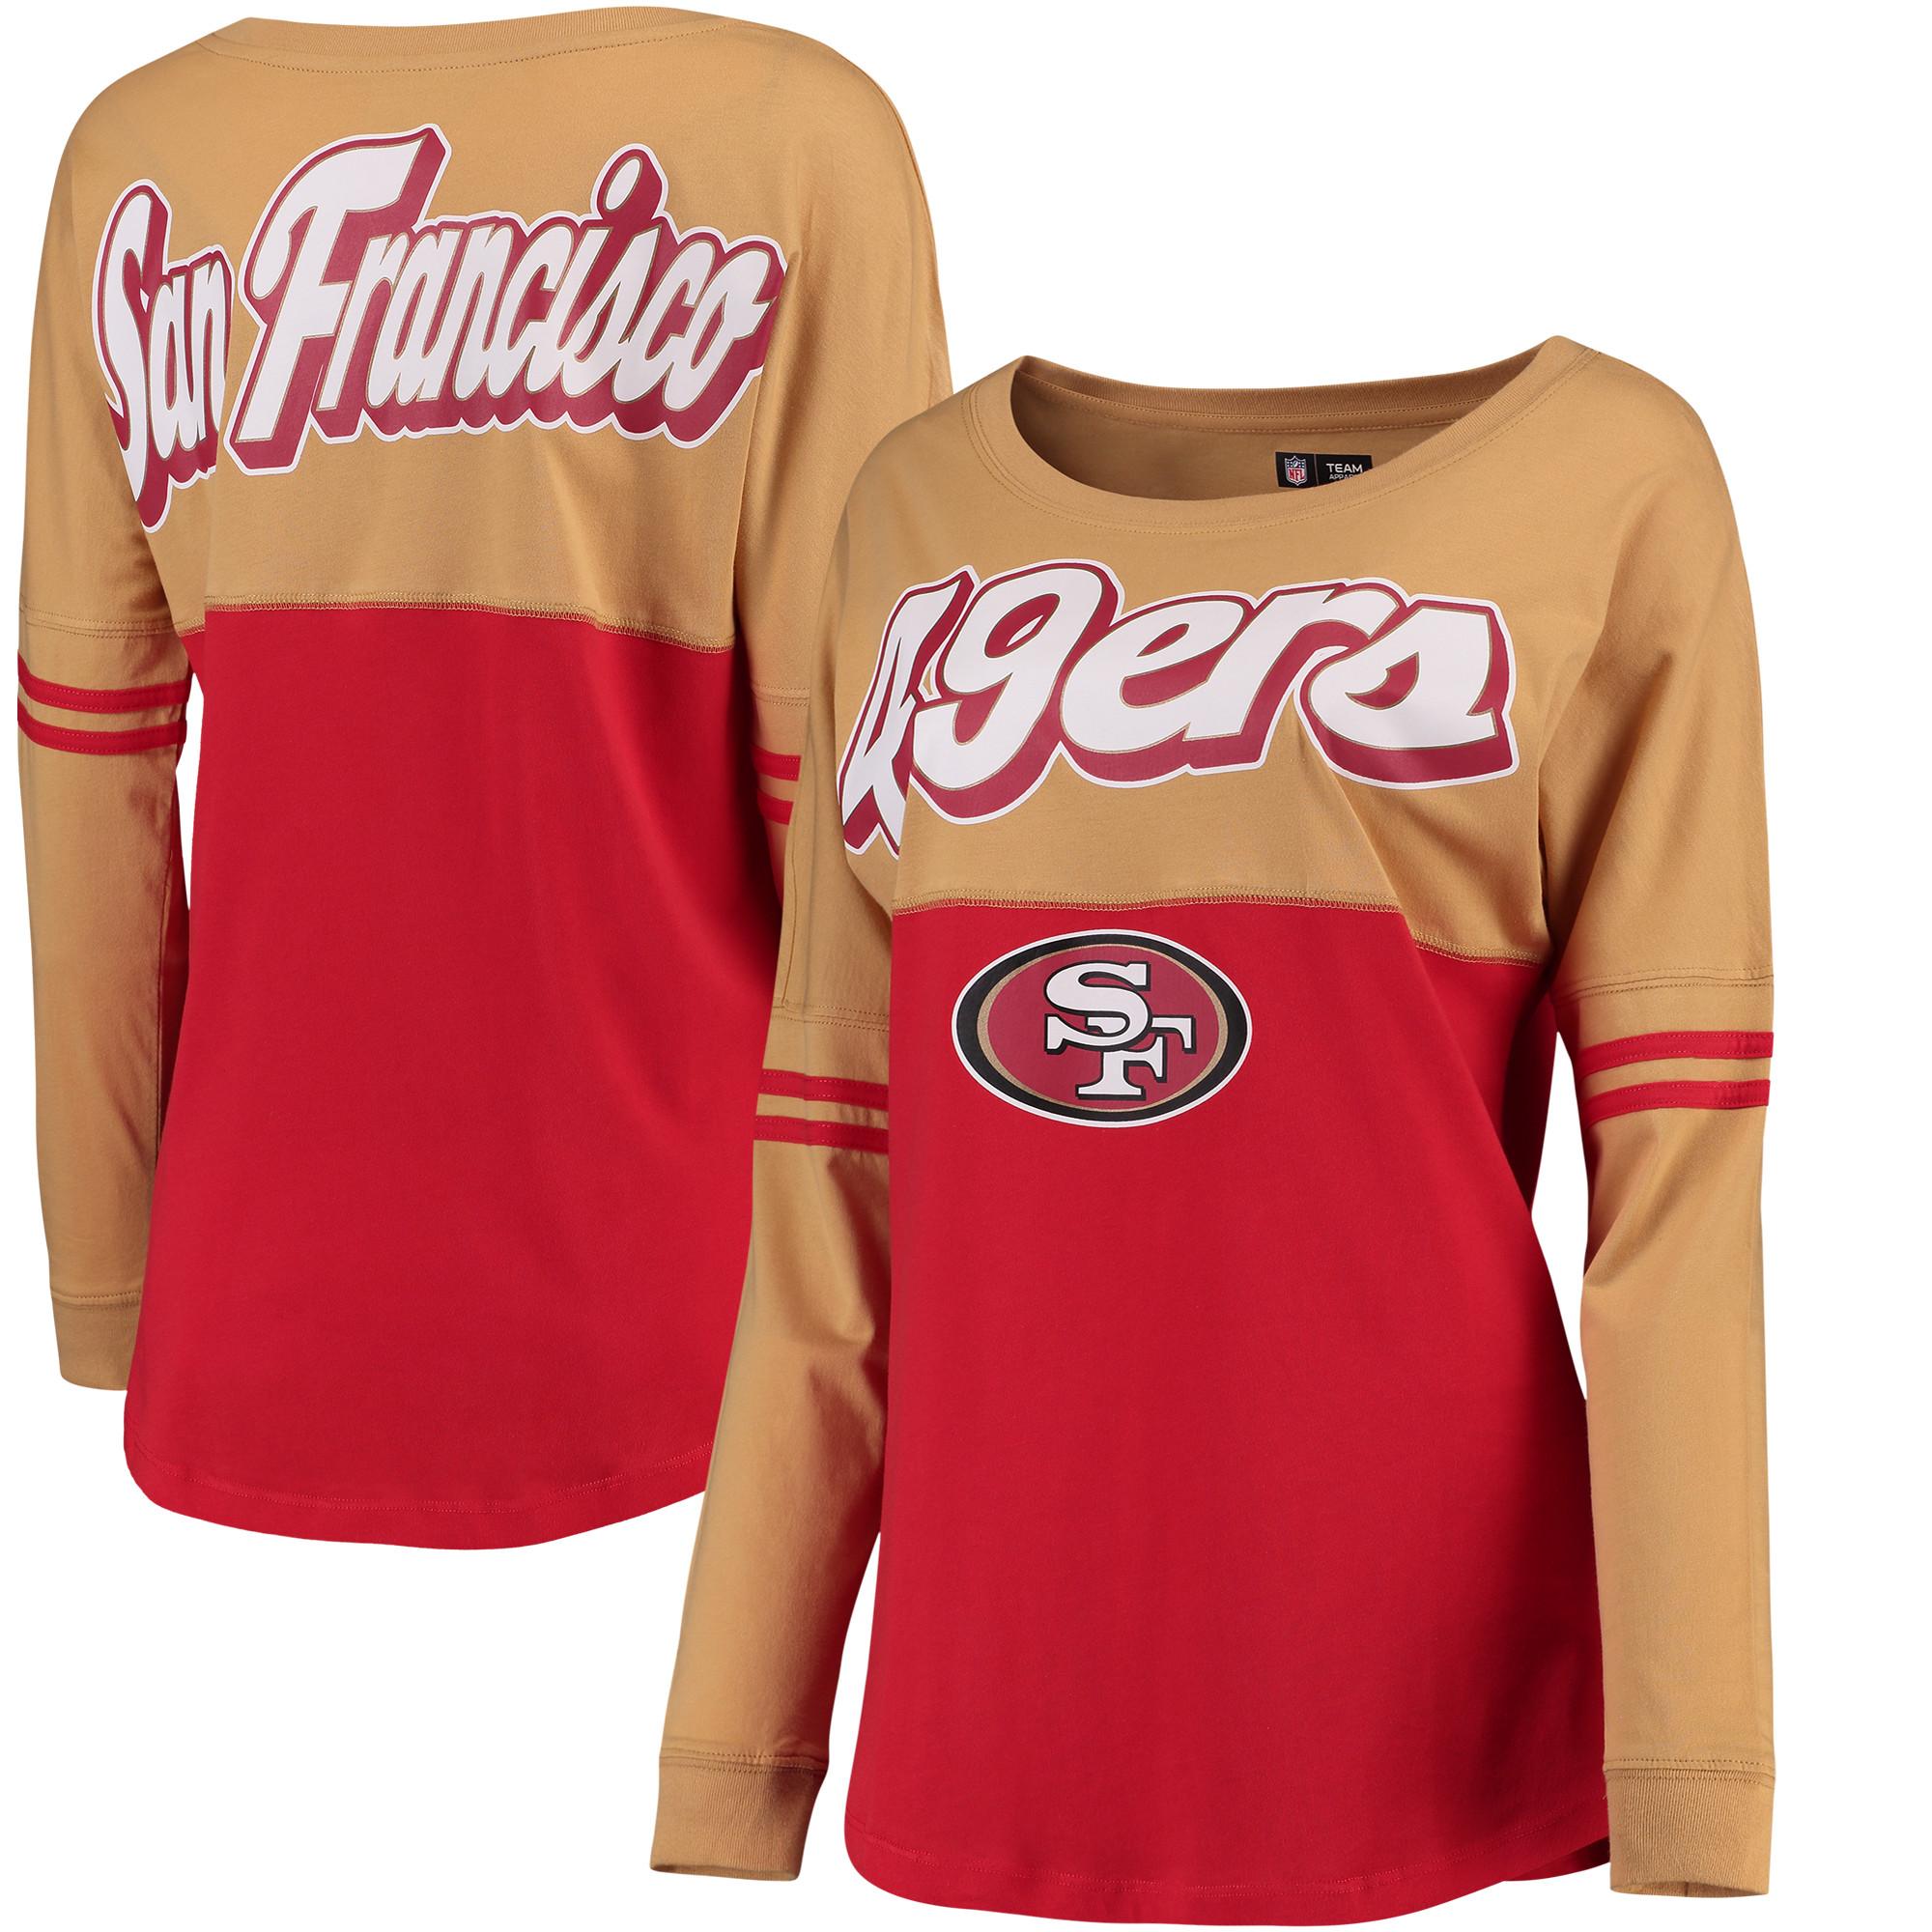 San Francisco 49ers 5th & Ocean by New Era Women's Athletic Varsity Long Sleeve T-Shirt - Gold/Scarlet